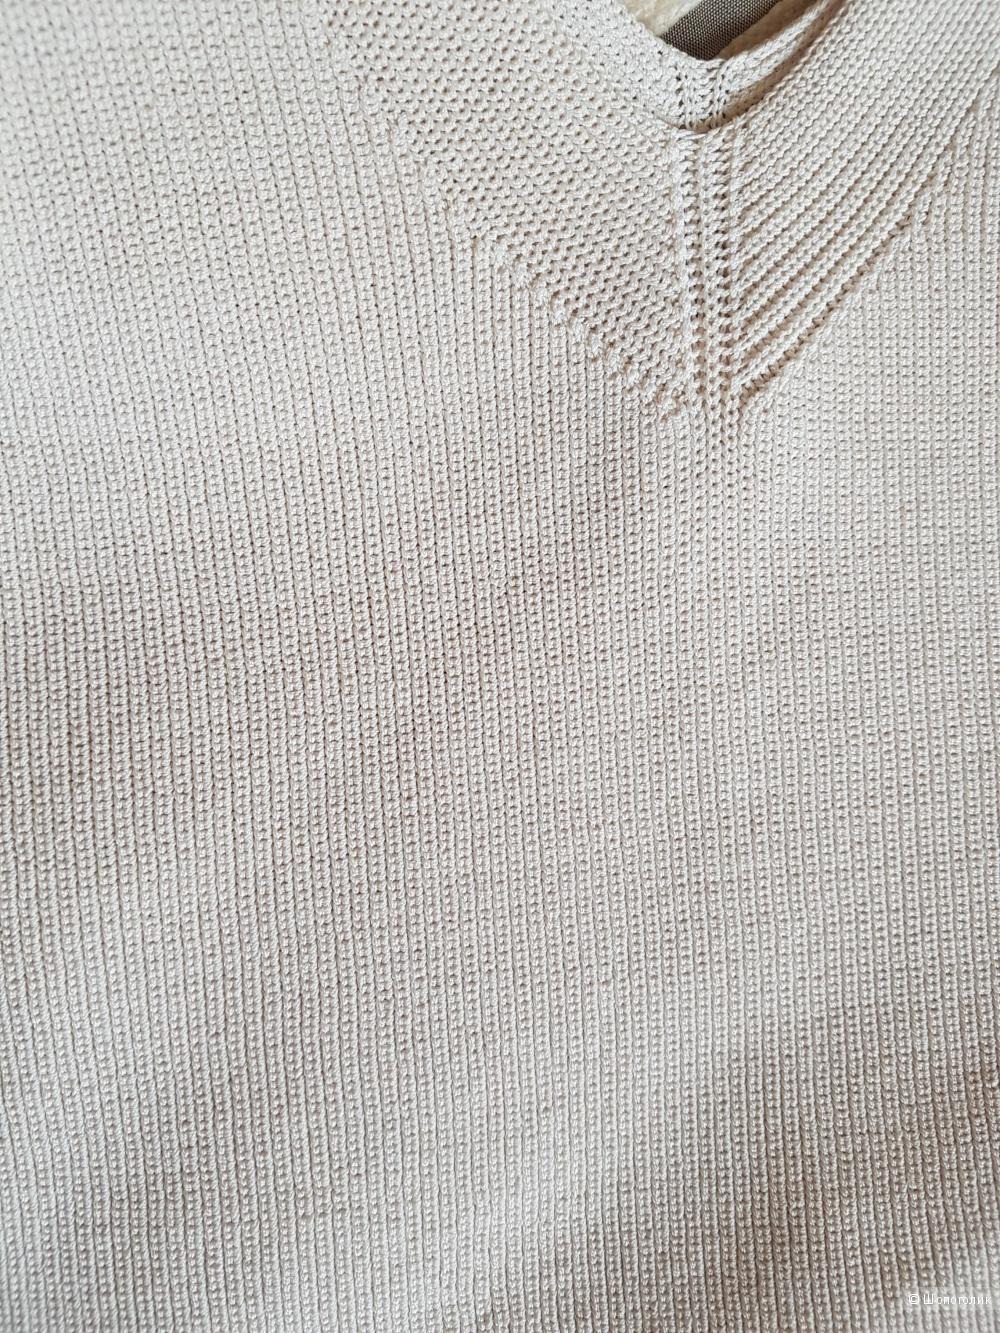 Топ H&M Trend, 38 размер